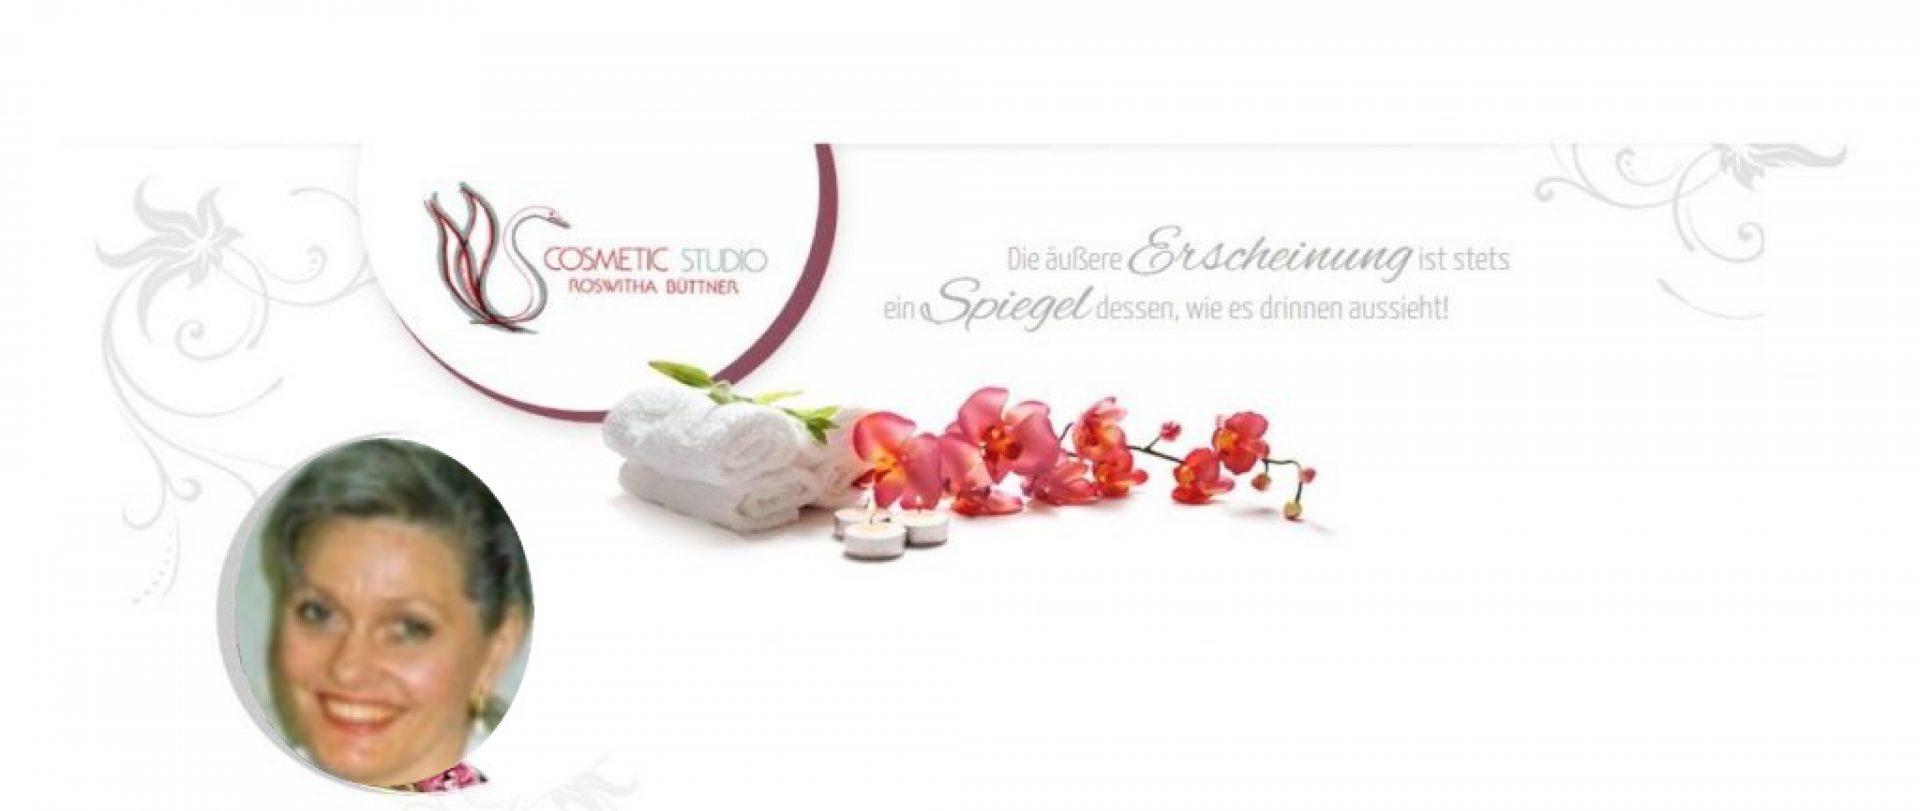 Cosmetic Studio Roswitha Buettner